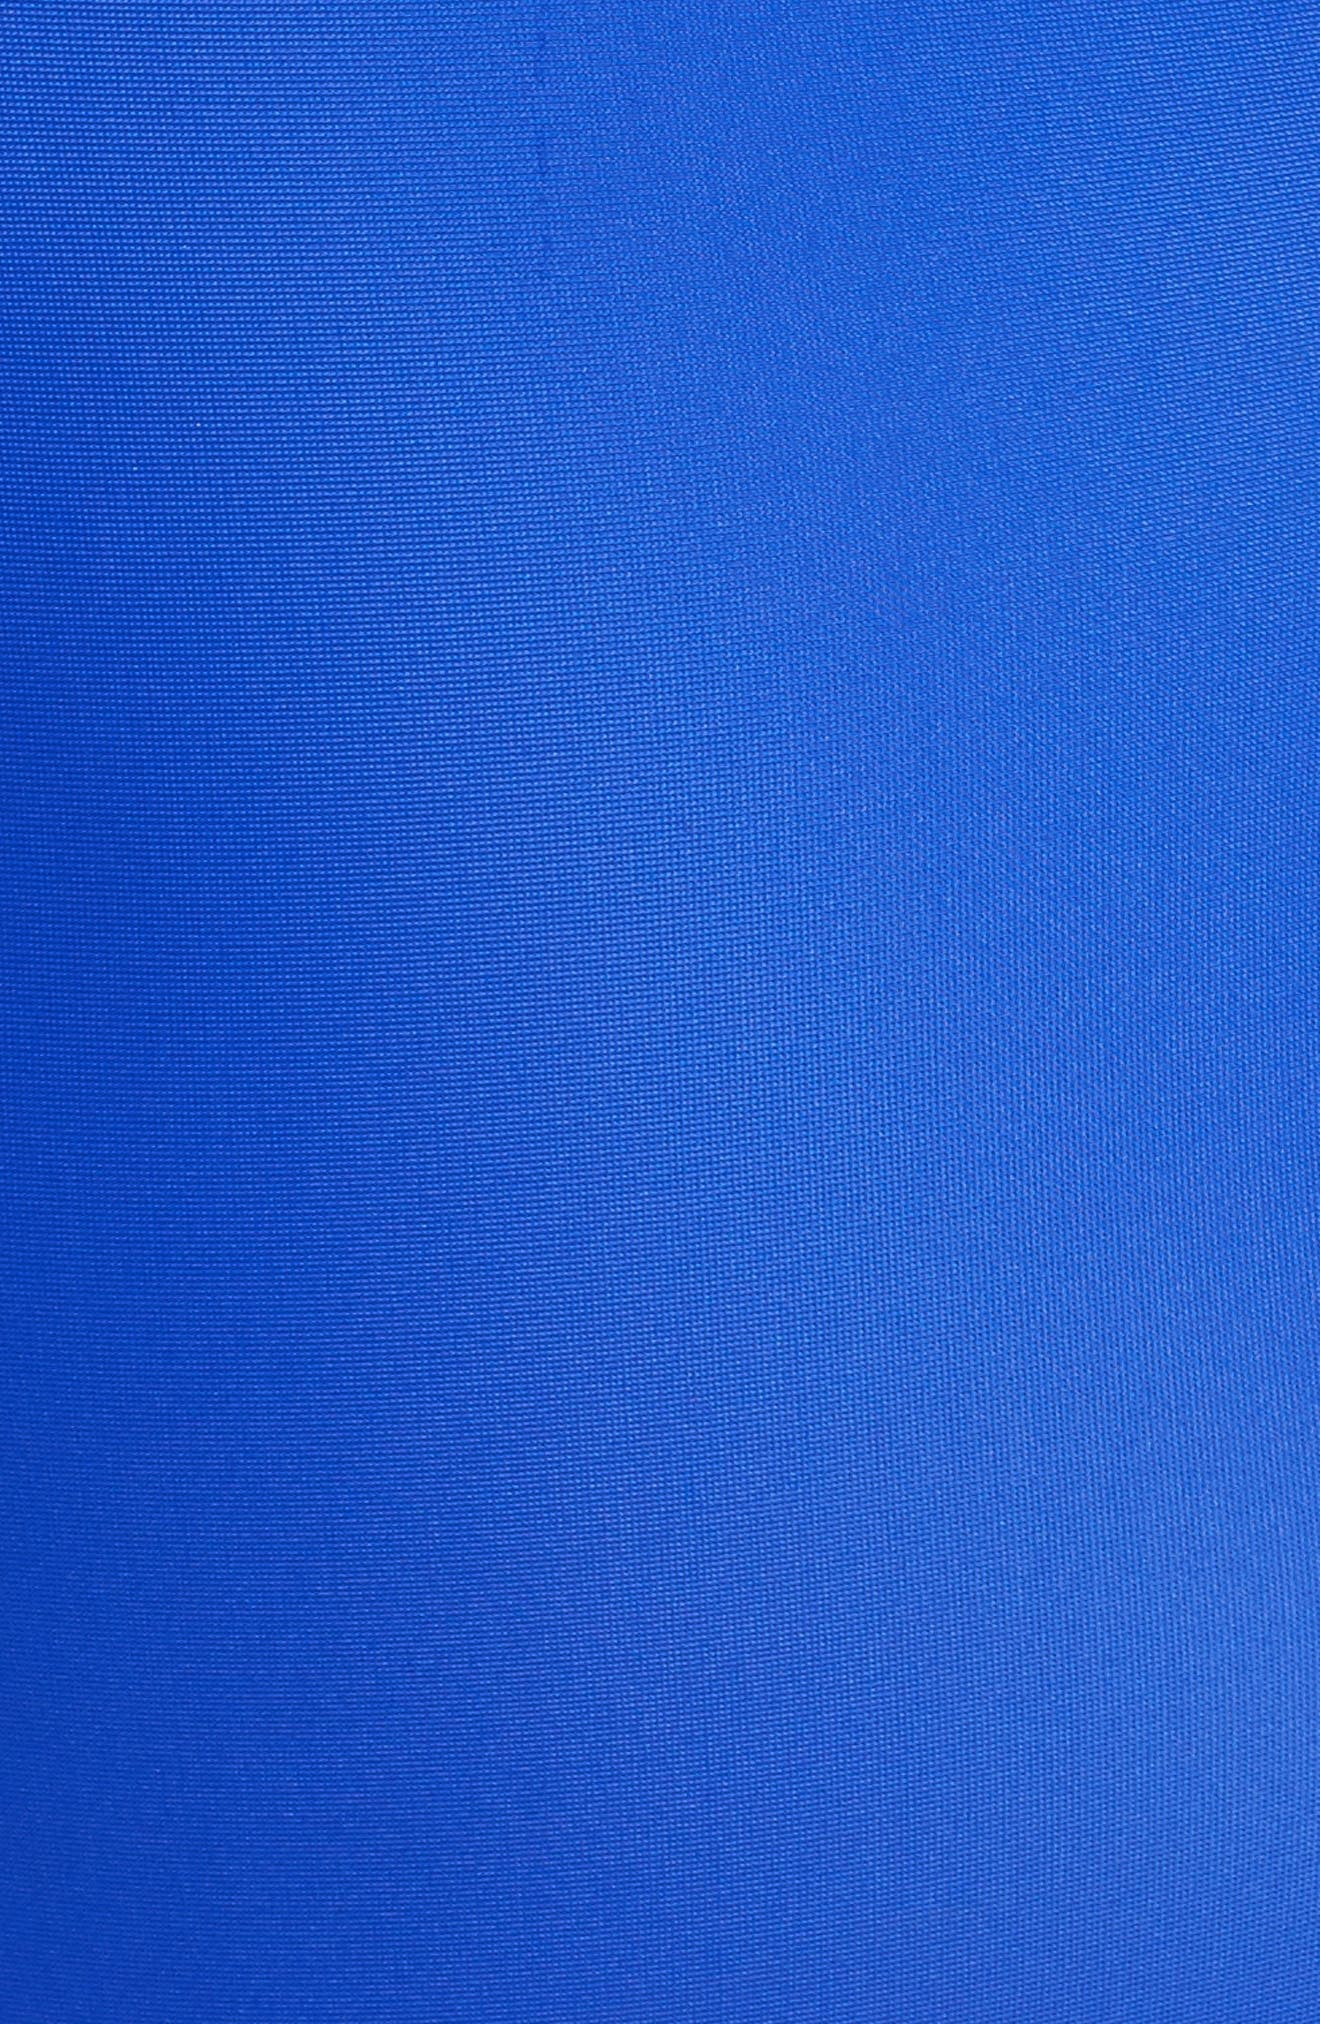 Mesh Side One-Piece Swimsuit,                             Alternate thumbnail 5, color,                             Blue/ Black